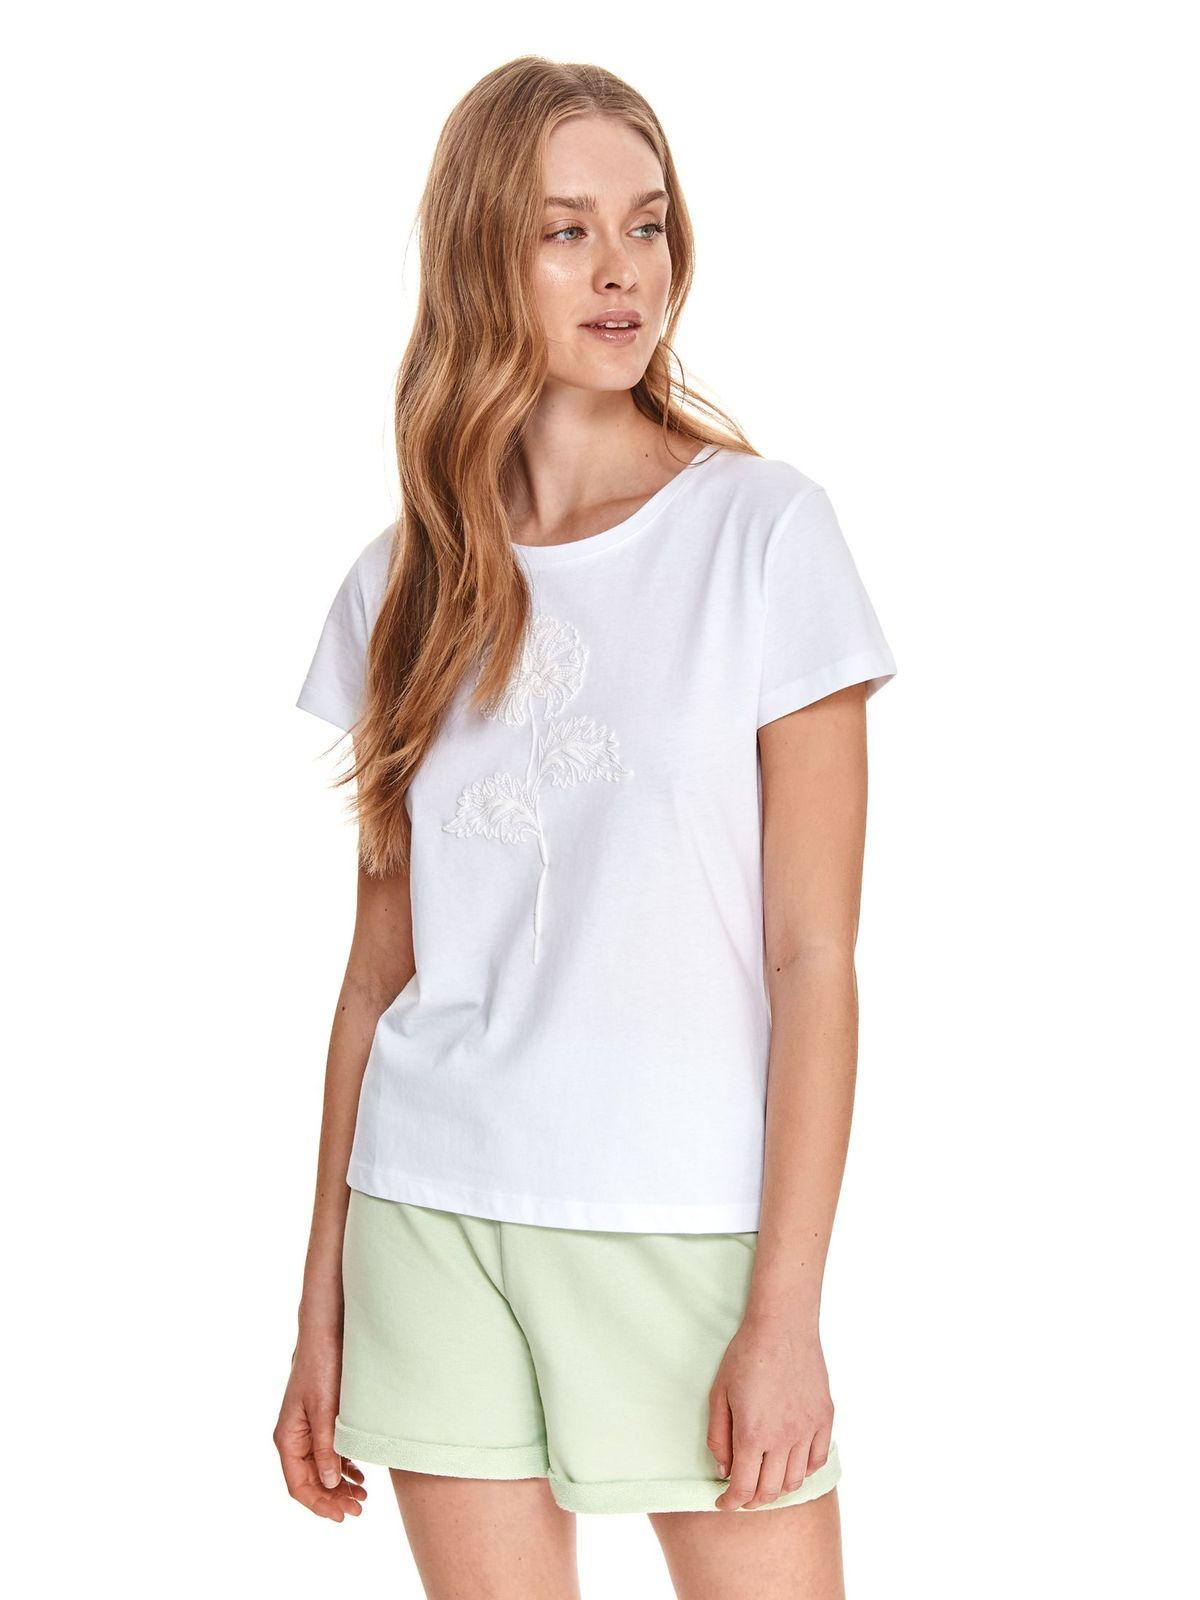 Tricou Top Secret alb din bumbac cu croi larg cu decolteu rotunjit cu imprimeuri grafice